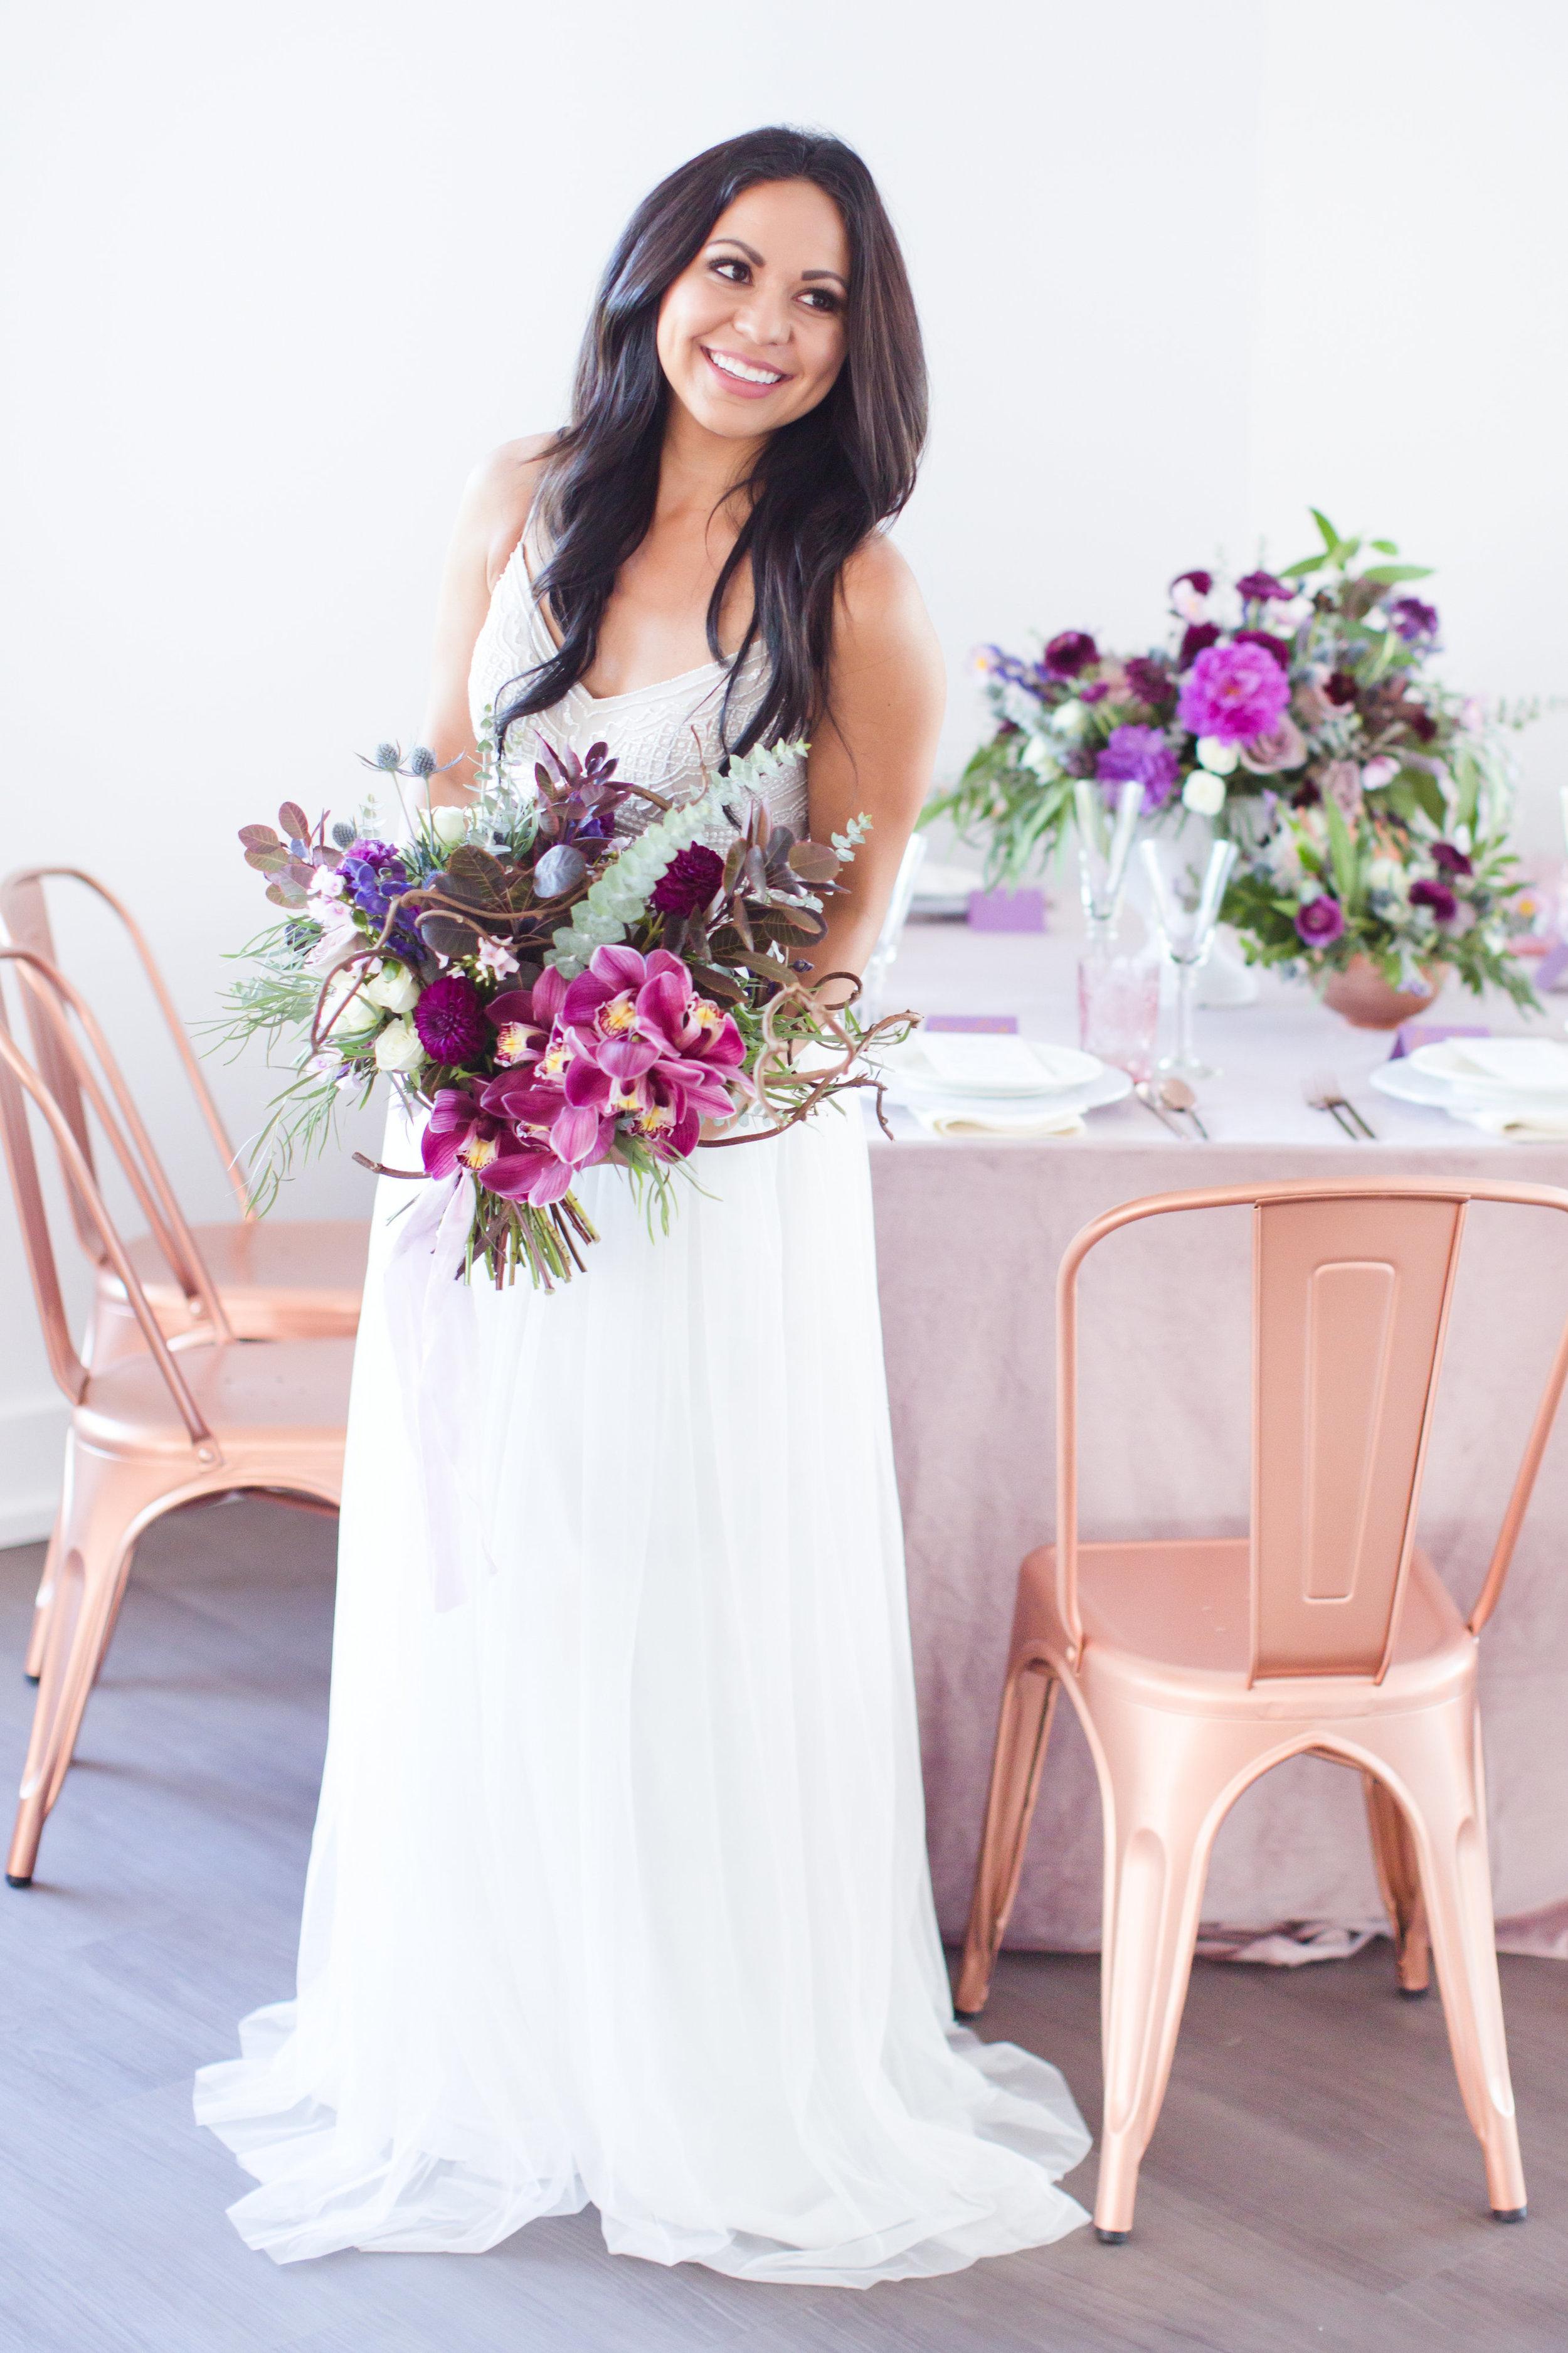 Amy & Jordan Workshop - Purple Anthropologie Inspired Wedding - Bride with purple bouquet